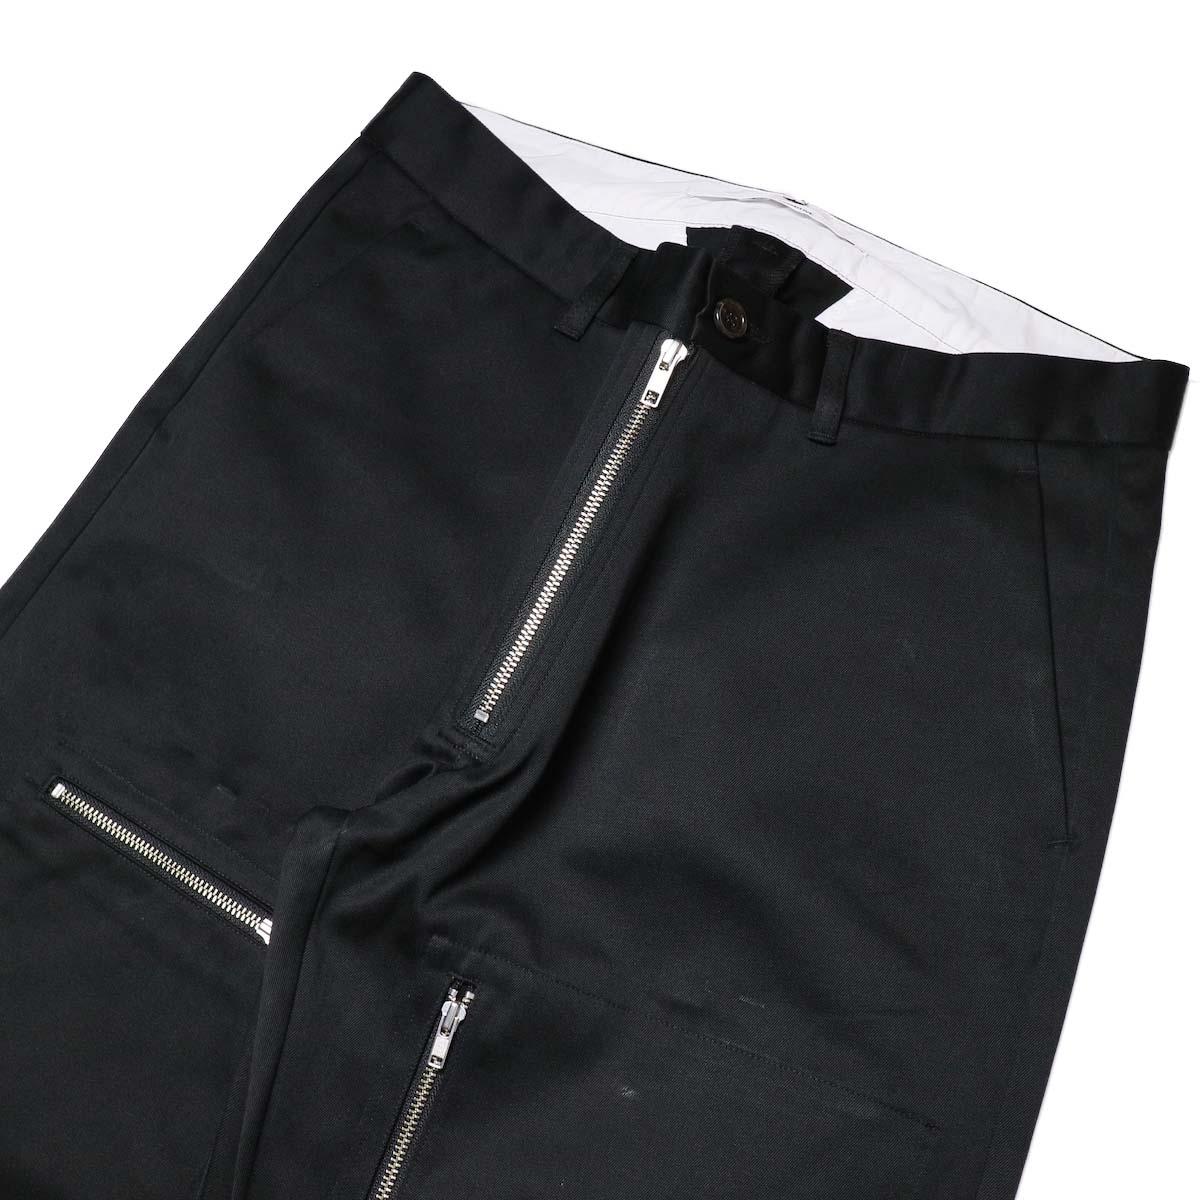 FUTURE PRIMITIVE / FP FZ FLIGHT CHINO PANTS (Black)ウエスト